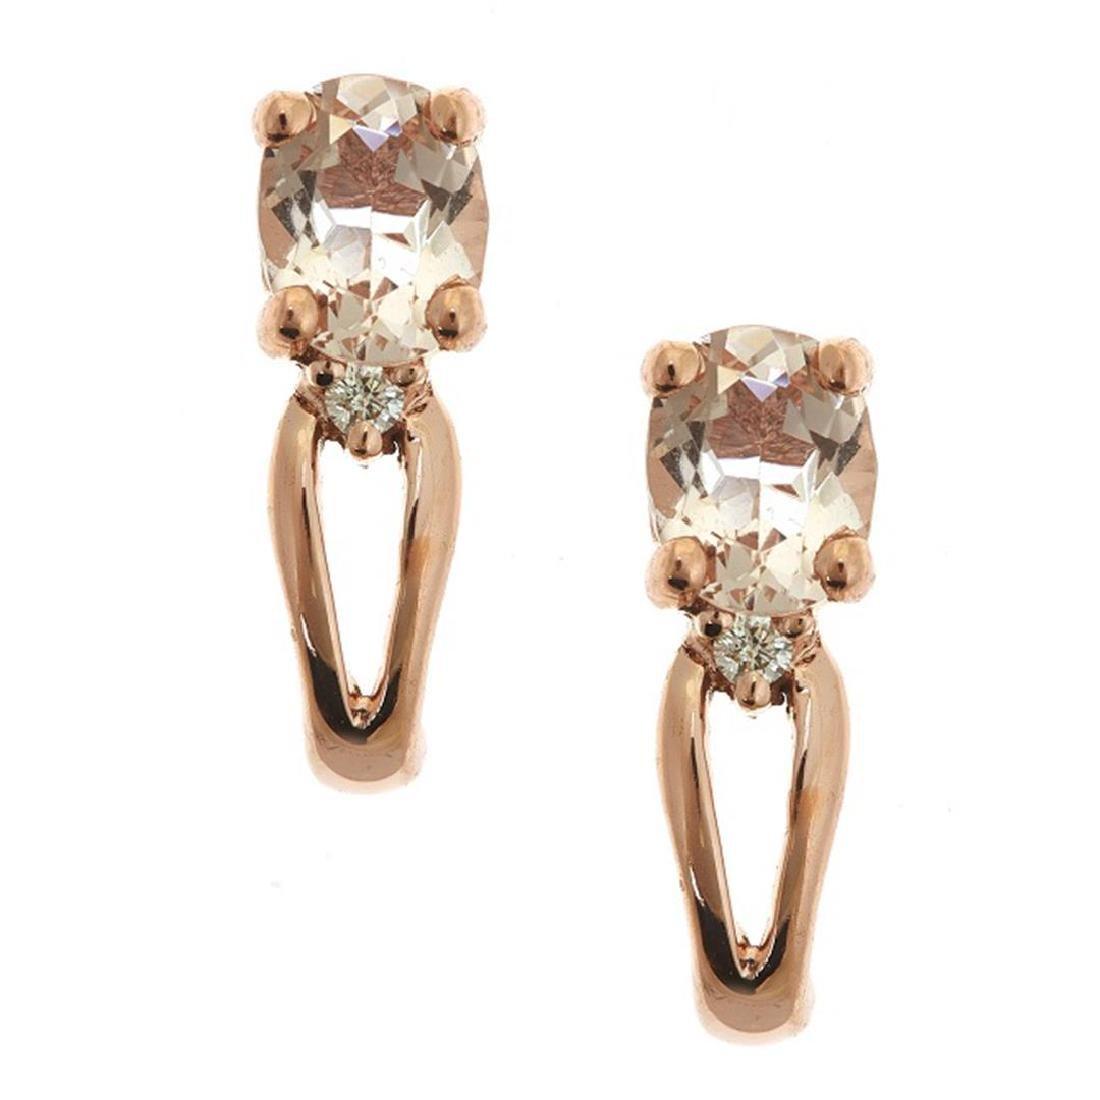 0.66 ctw Morganite and Diamond Earrings - 14KT Rose